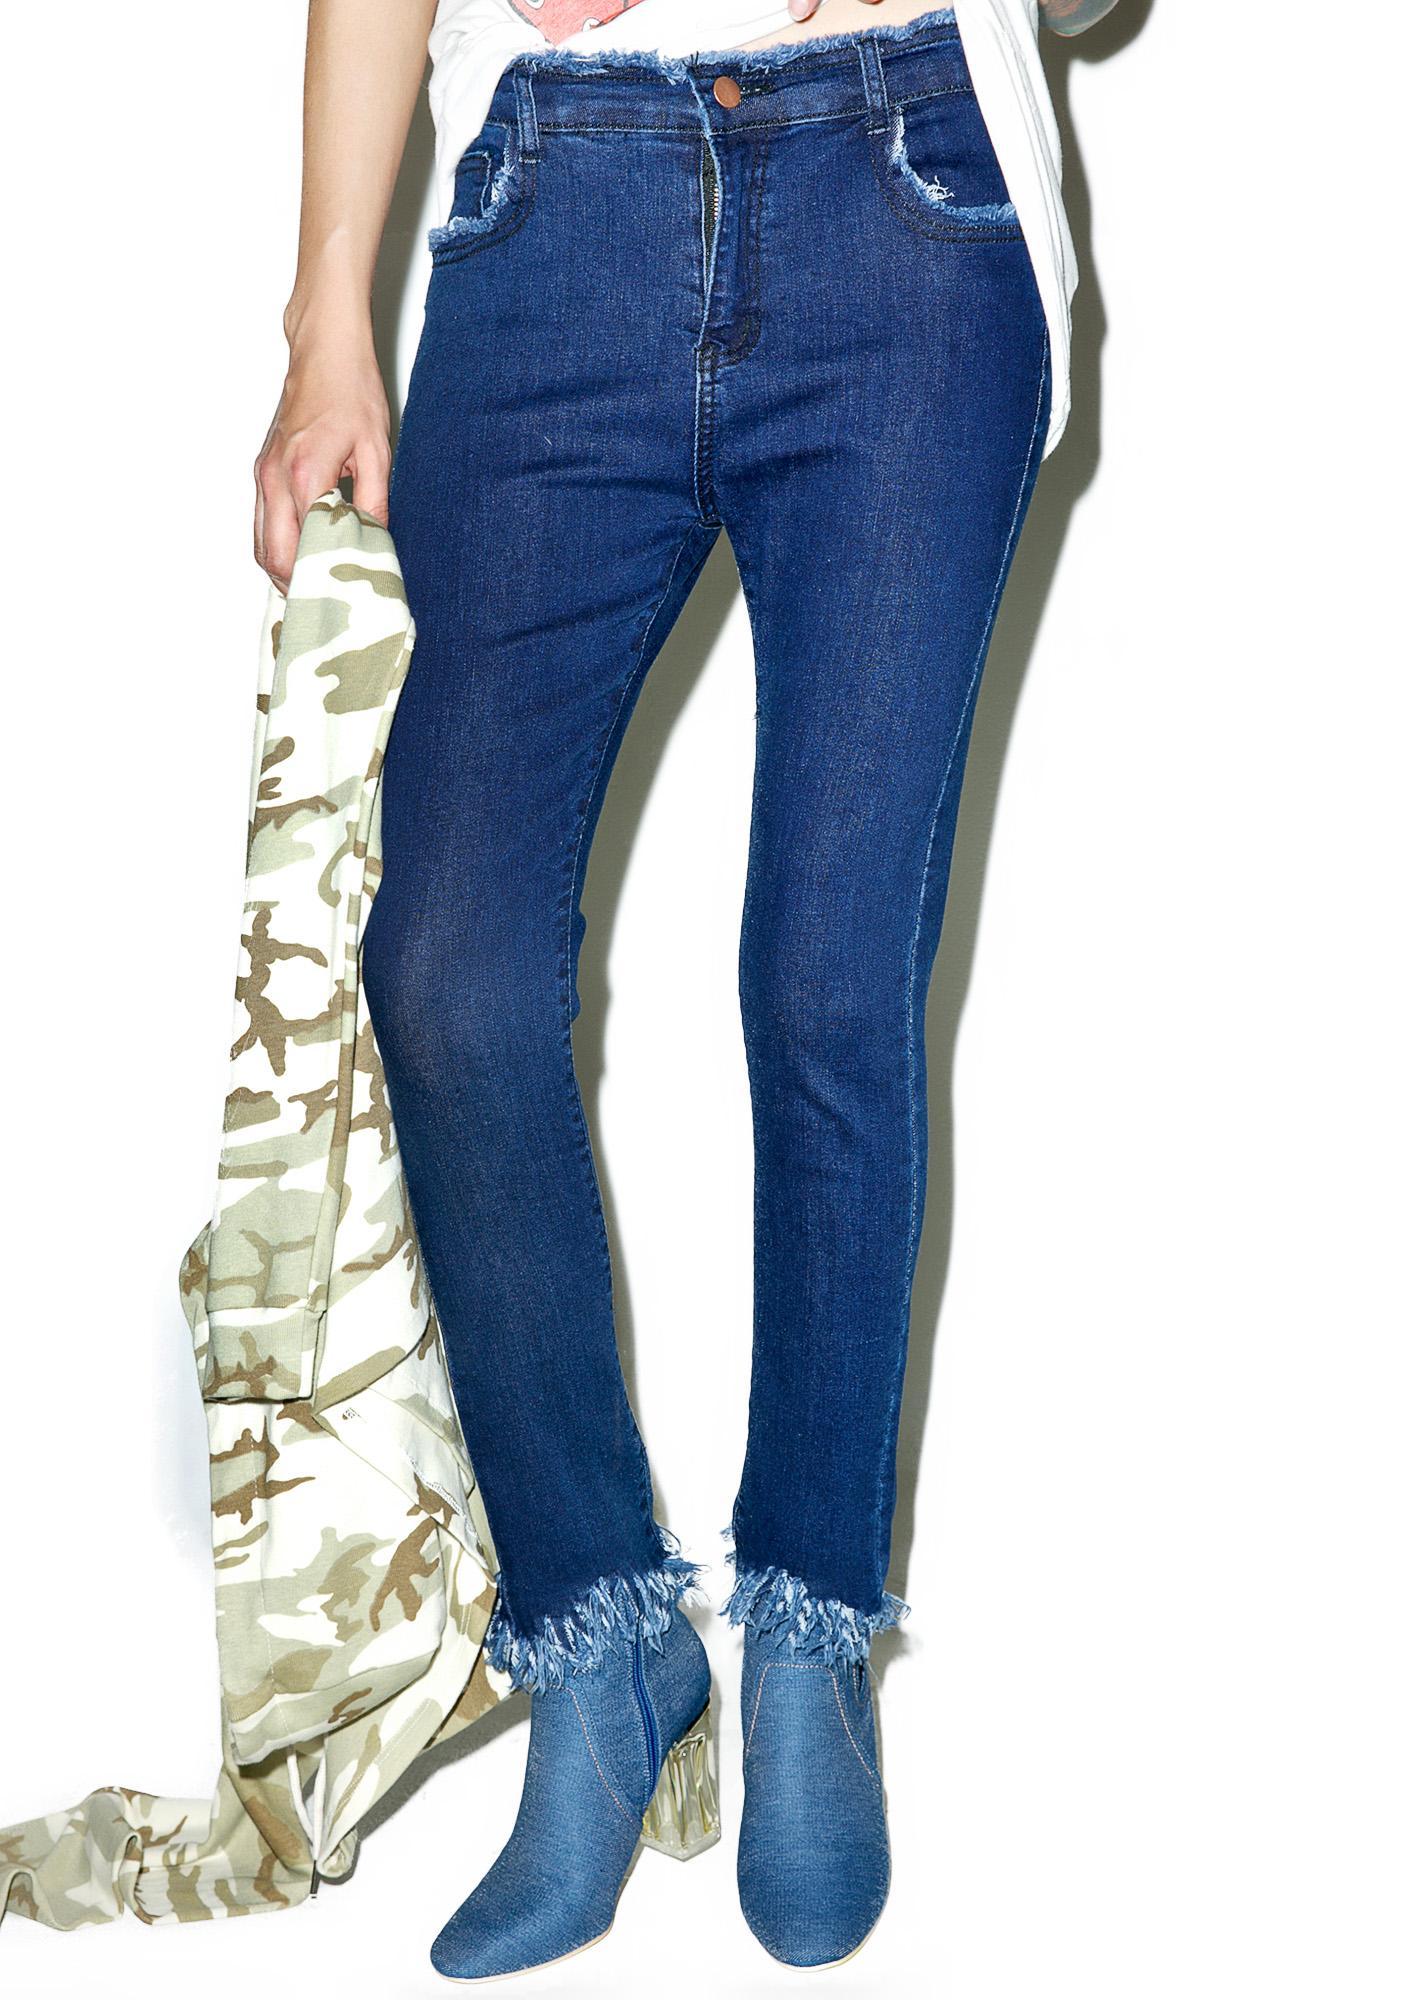 Rewrite Skinny Jeans